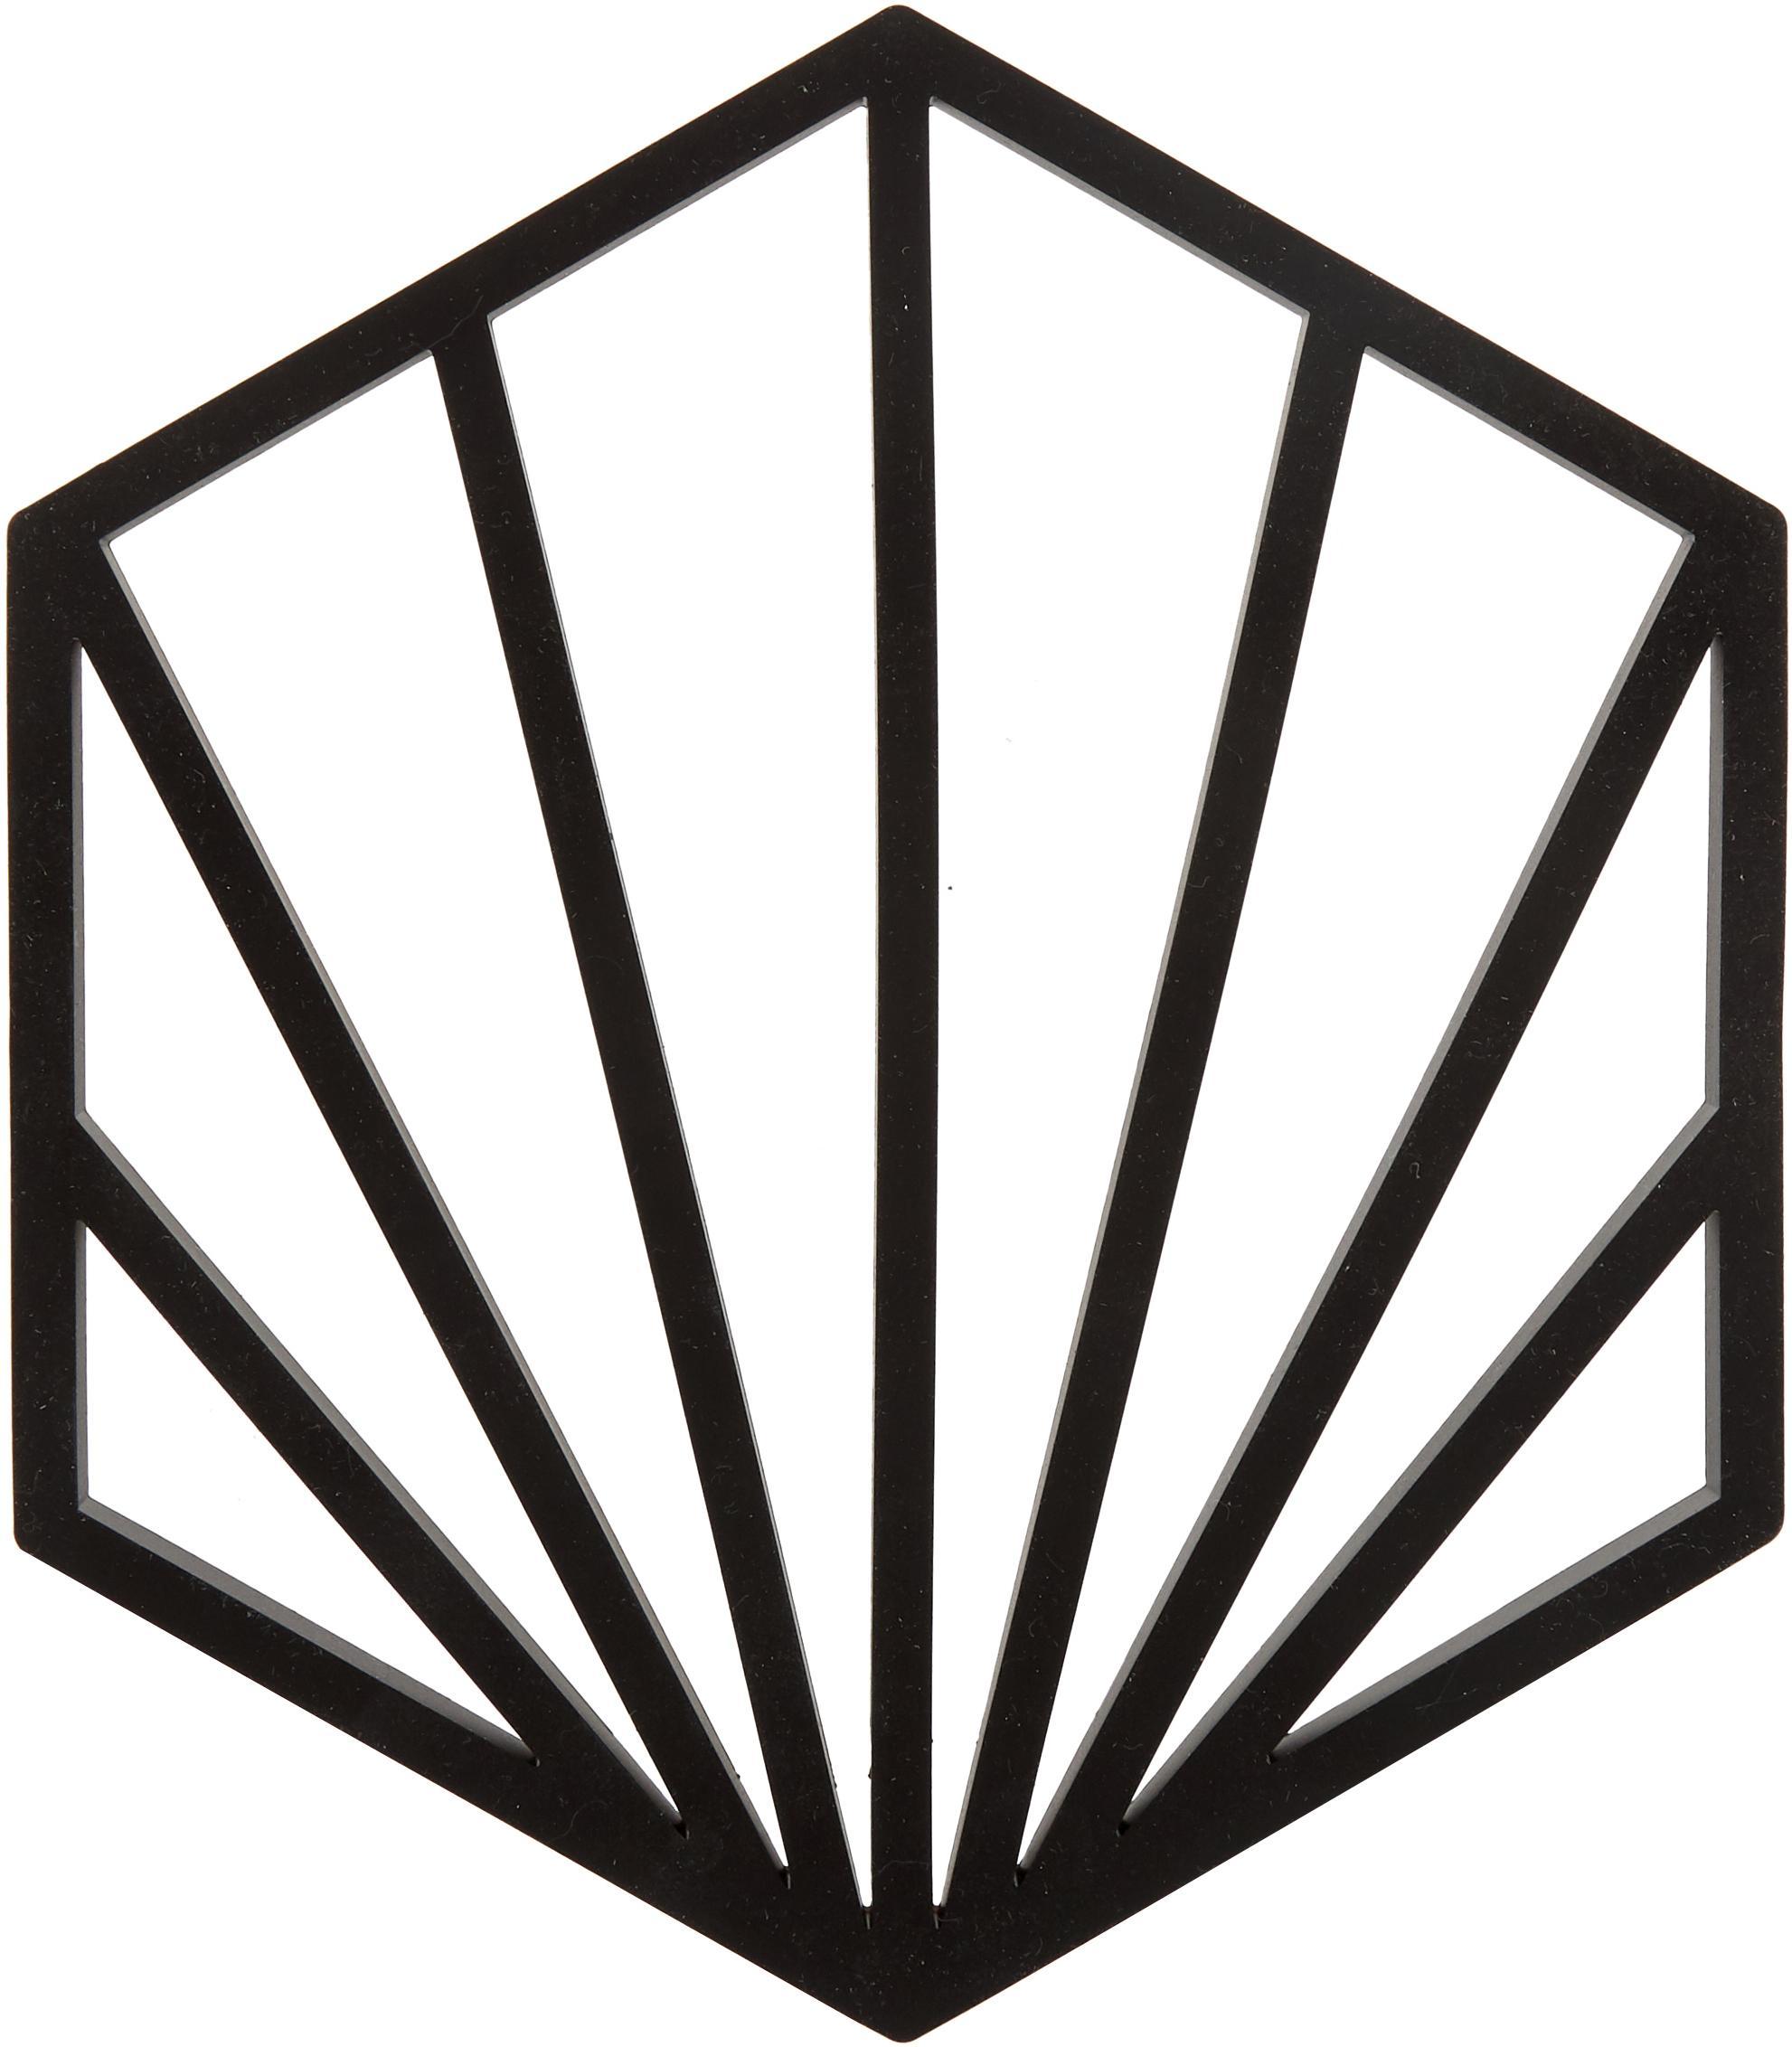 Panonderzetter Shell, 2 stuks, Siliconen, Zwart, 16 x 1 cm